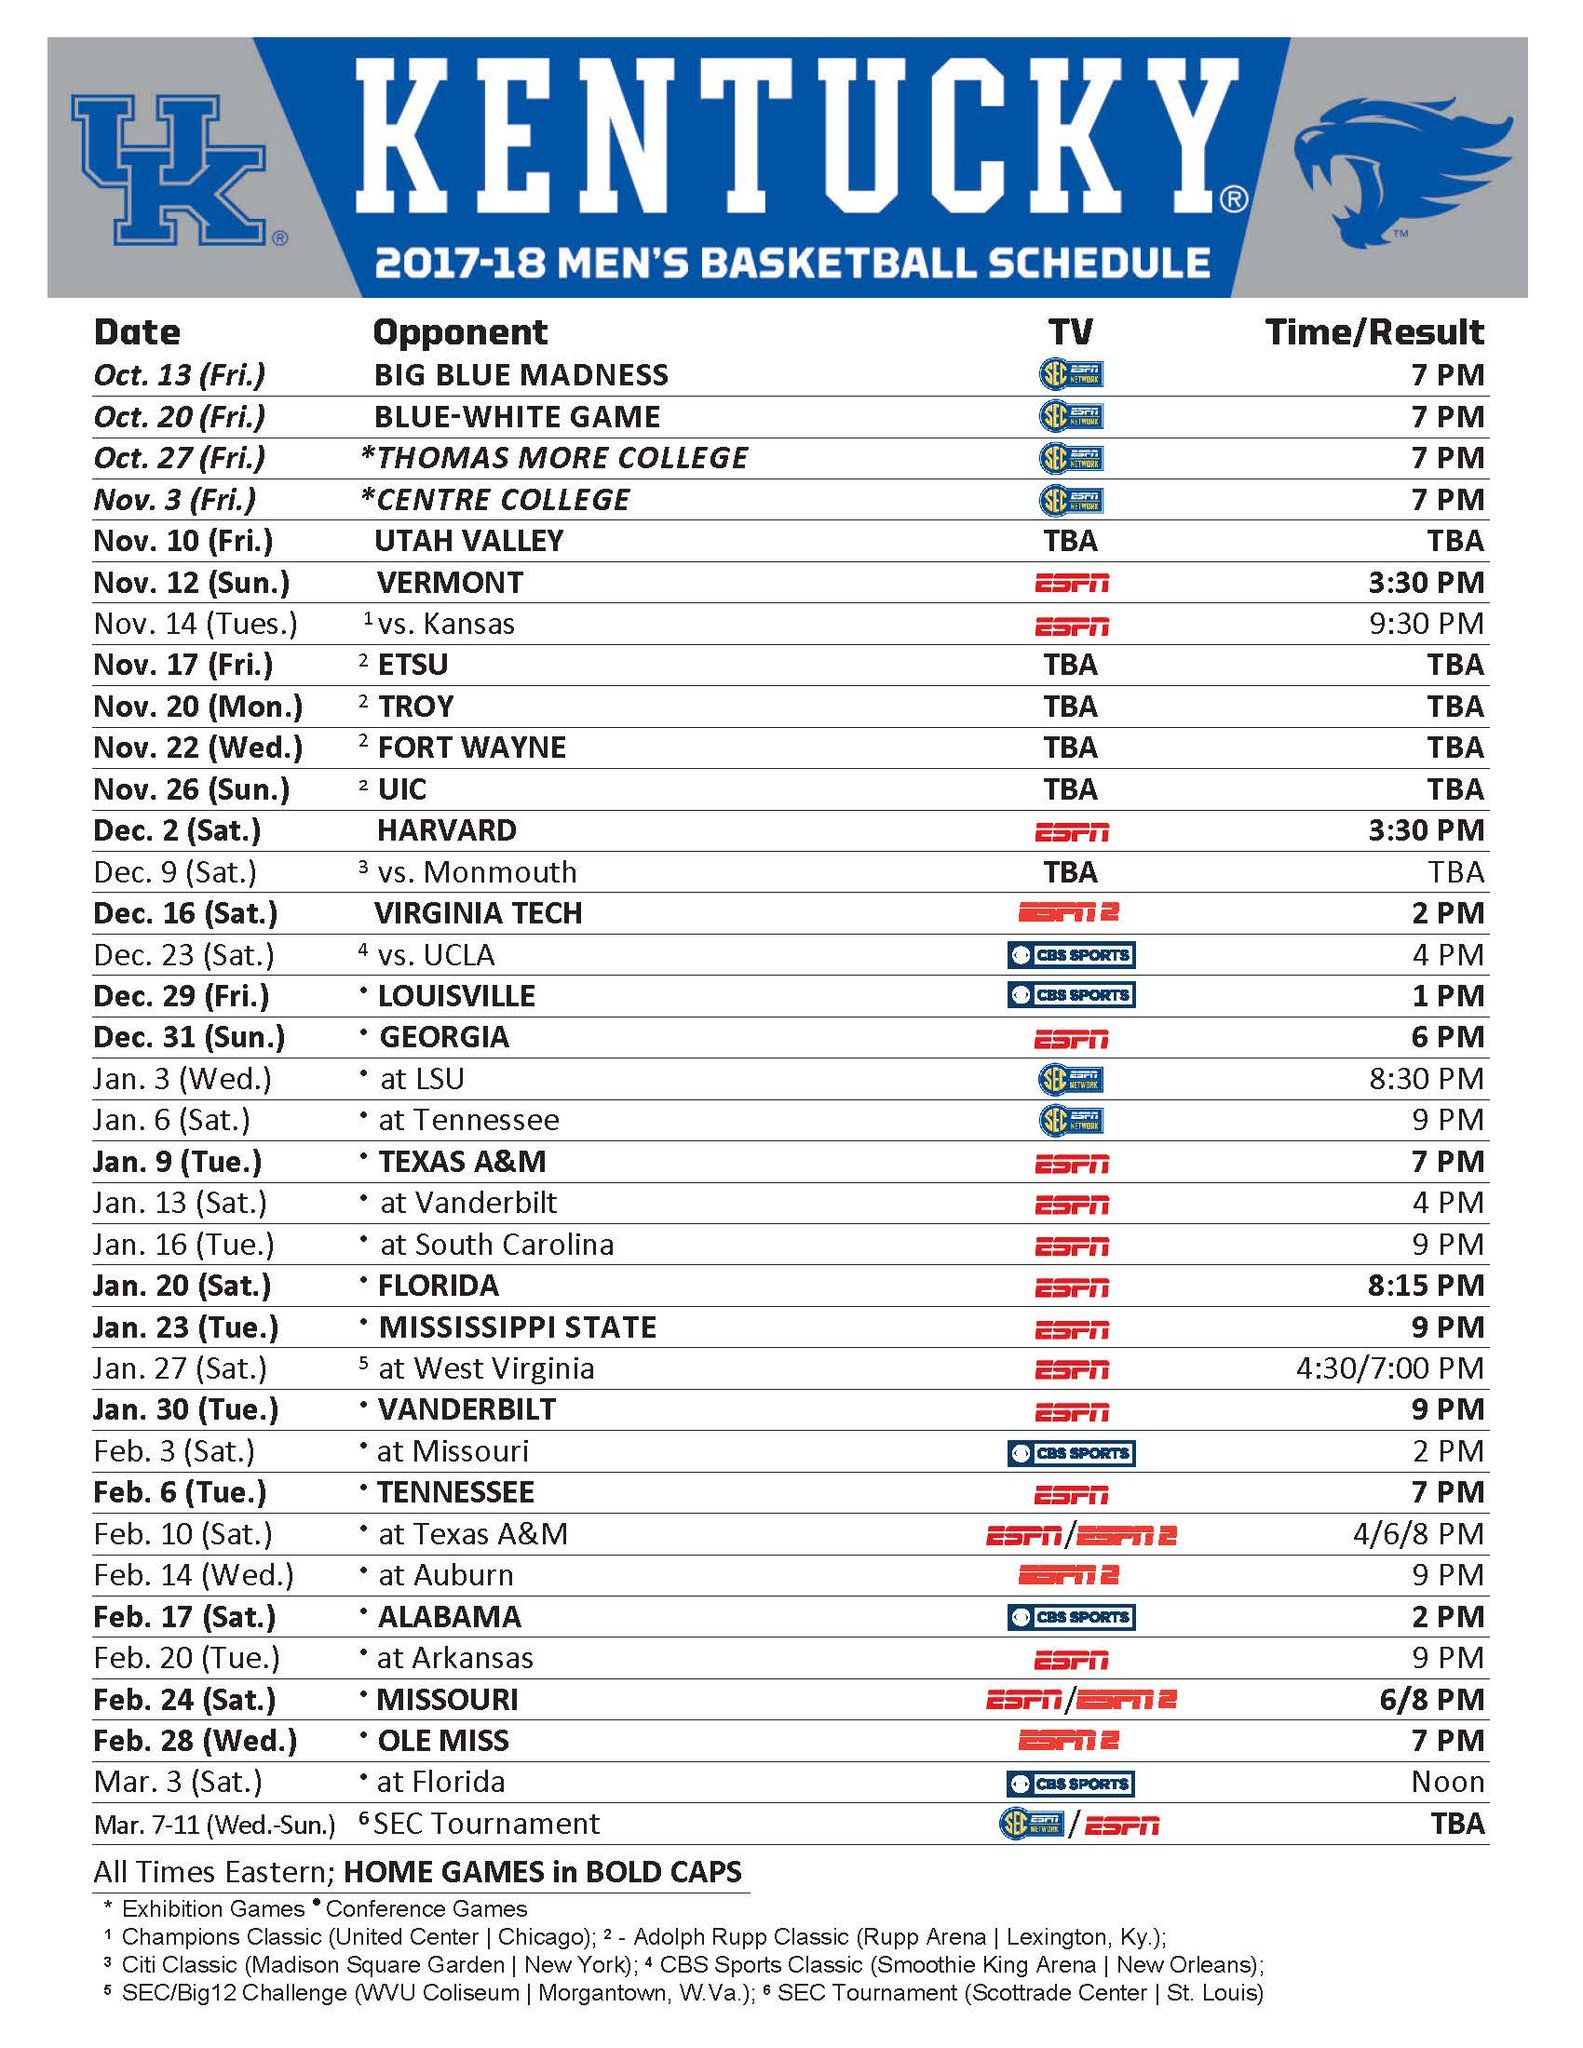 Pin By Myra Kelly On Sports Basketball Schedule Kentucky Kentucky Basketball Schedule